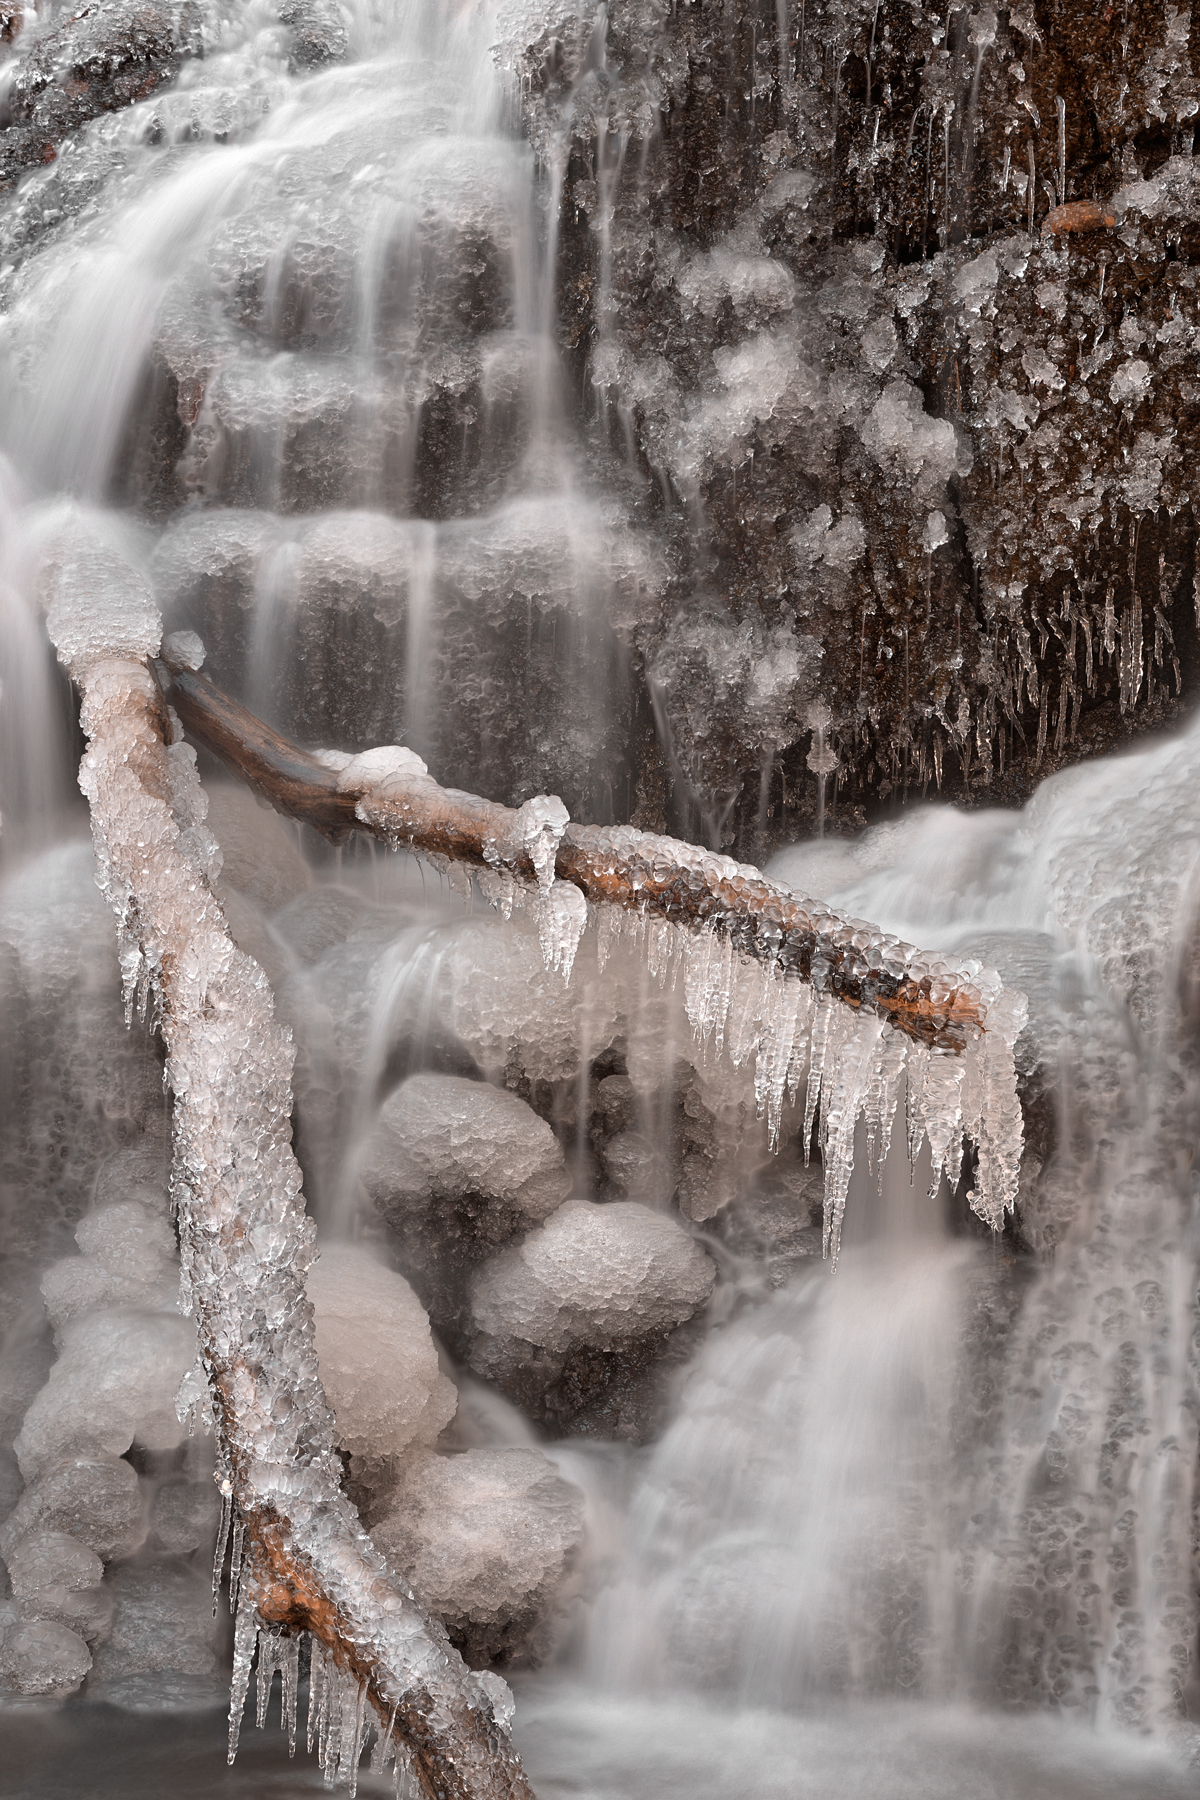 Frozen avalon falls - hdr photo